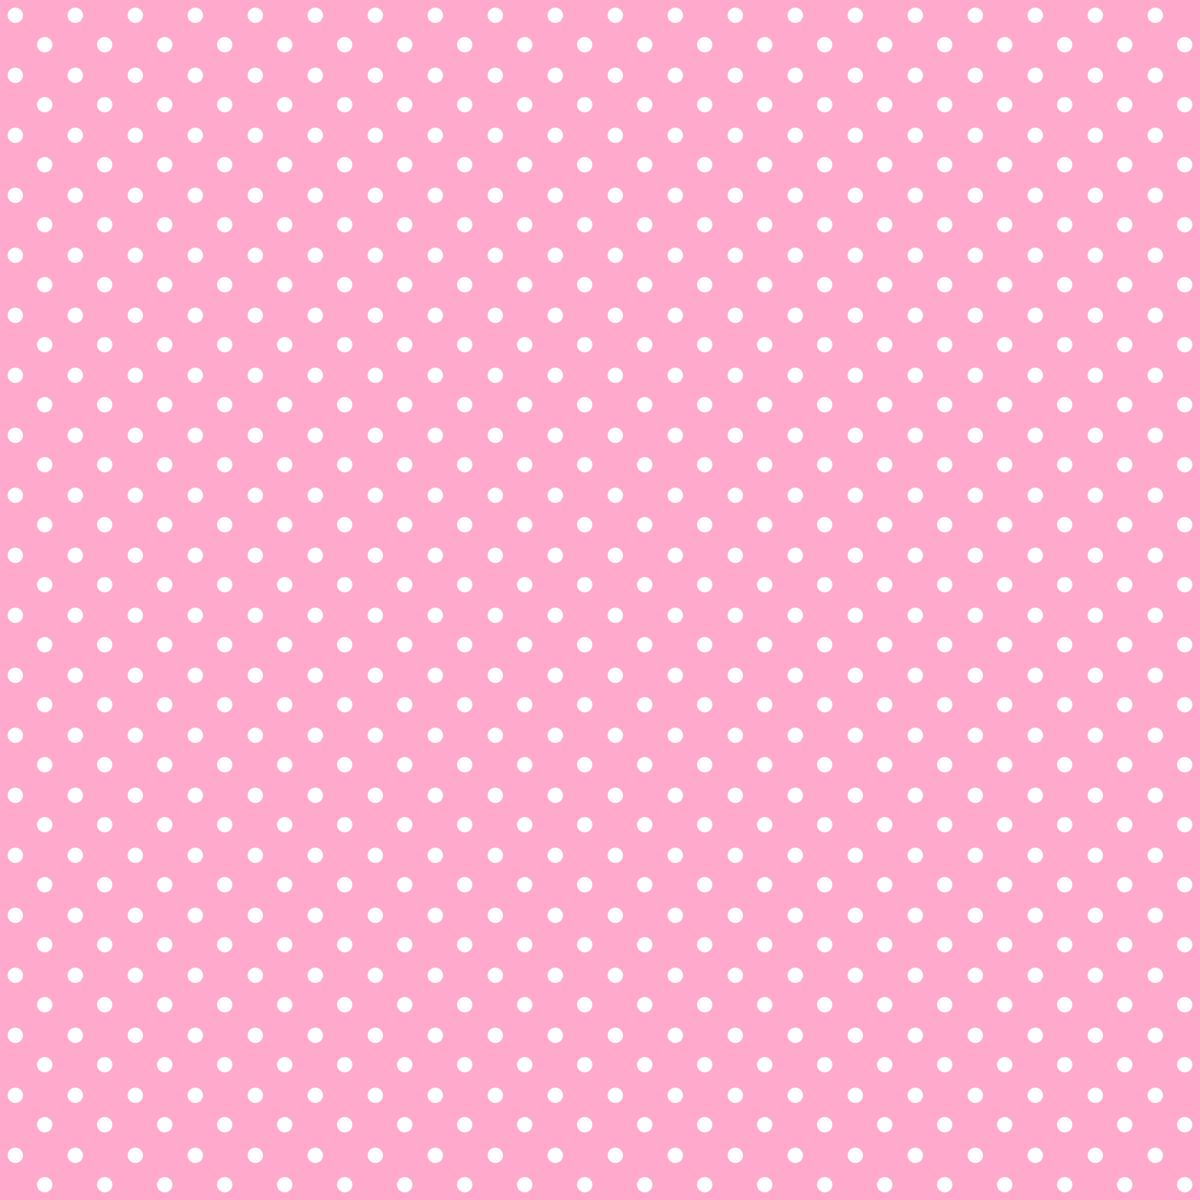 FREE printable pink polka dot pattern paper | FREE PRINTABLES ...